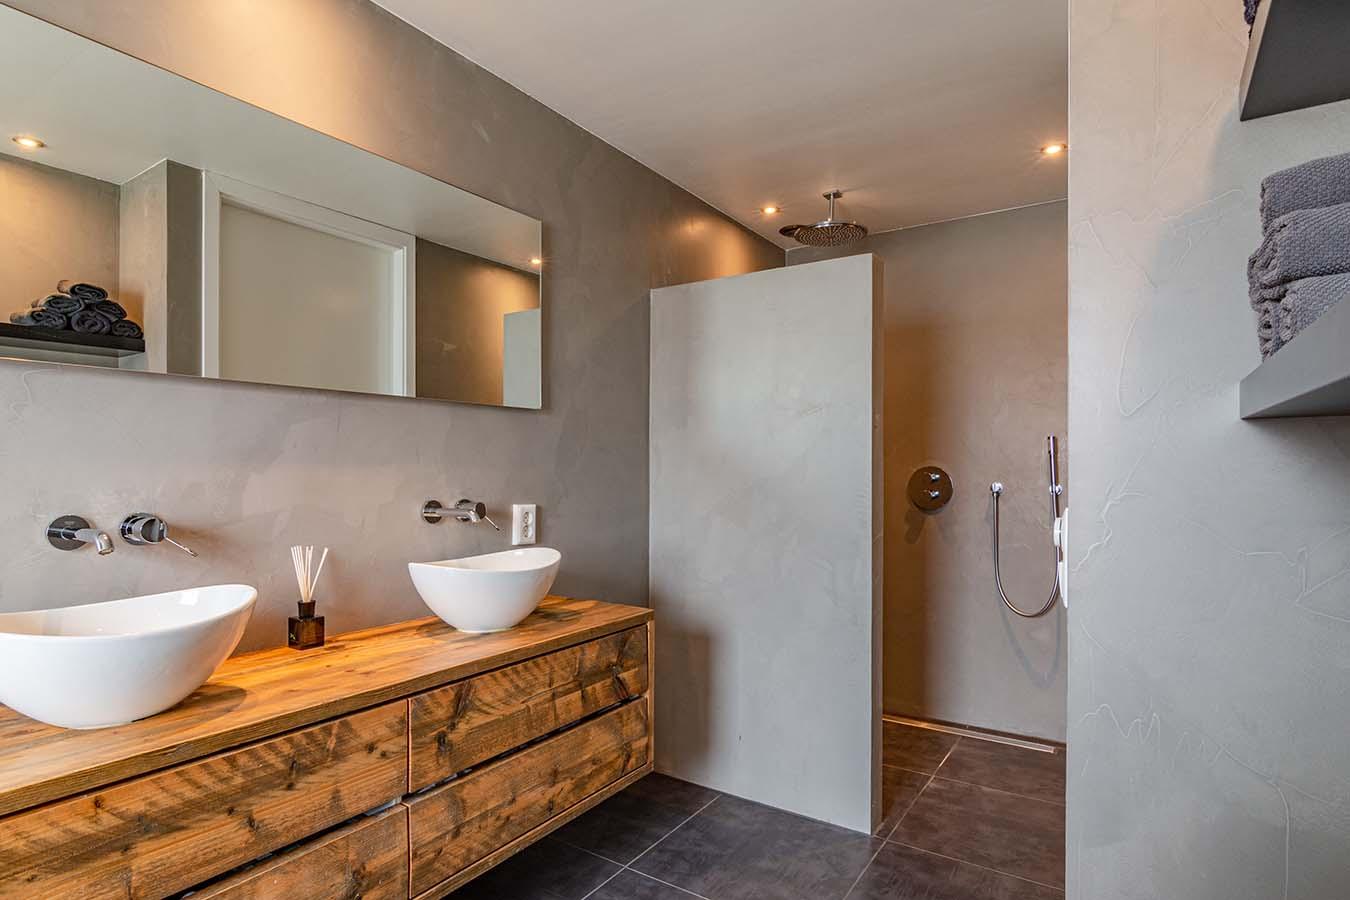 wastafels in de badkamer